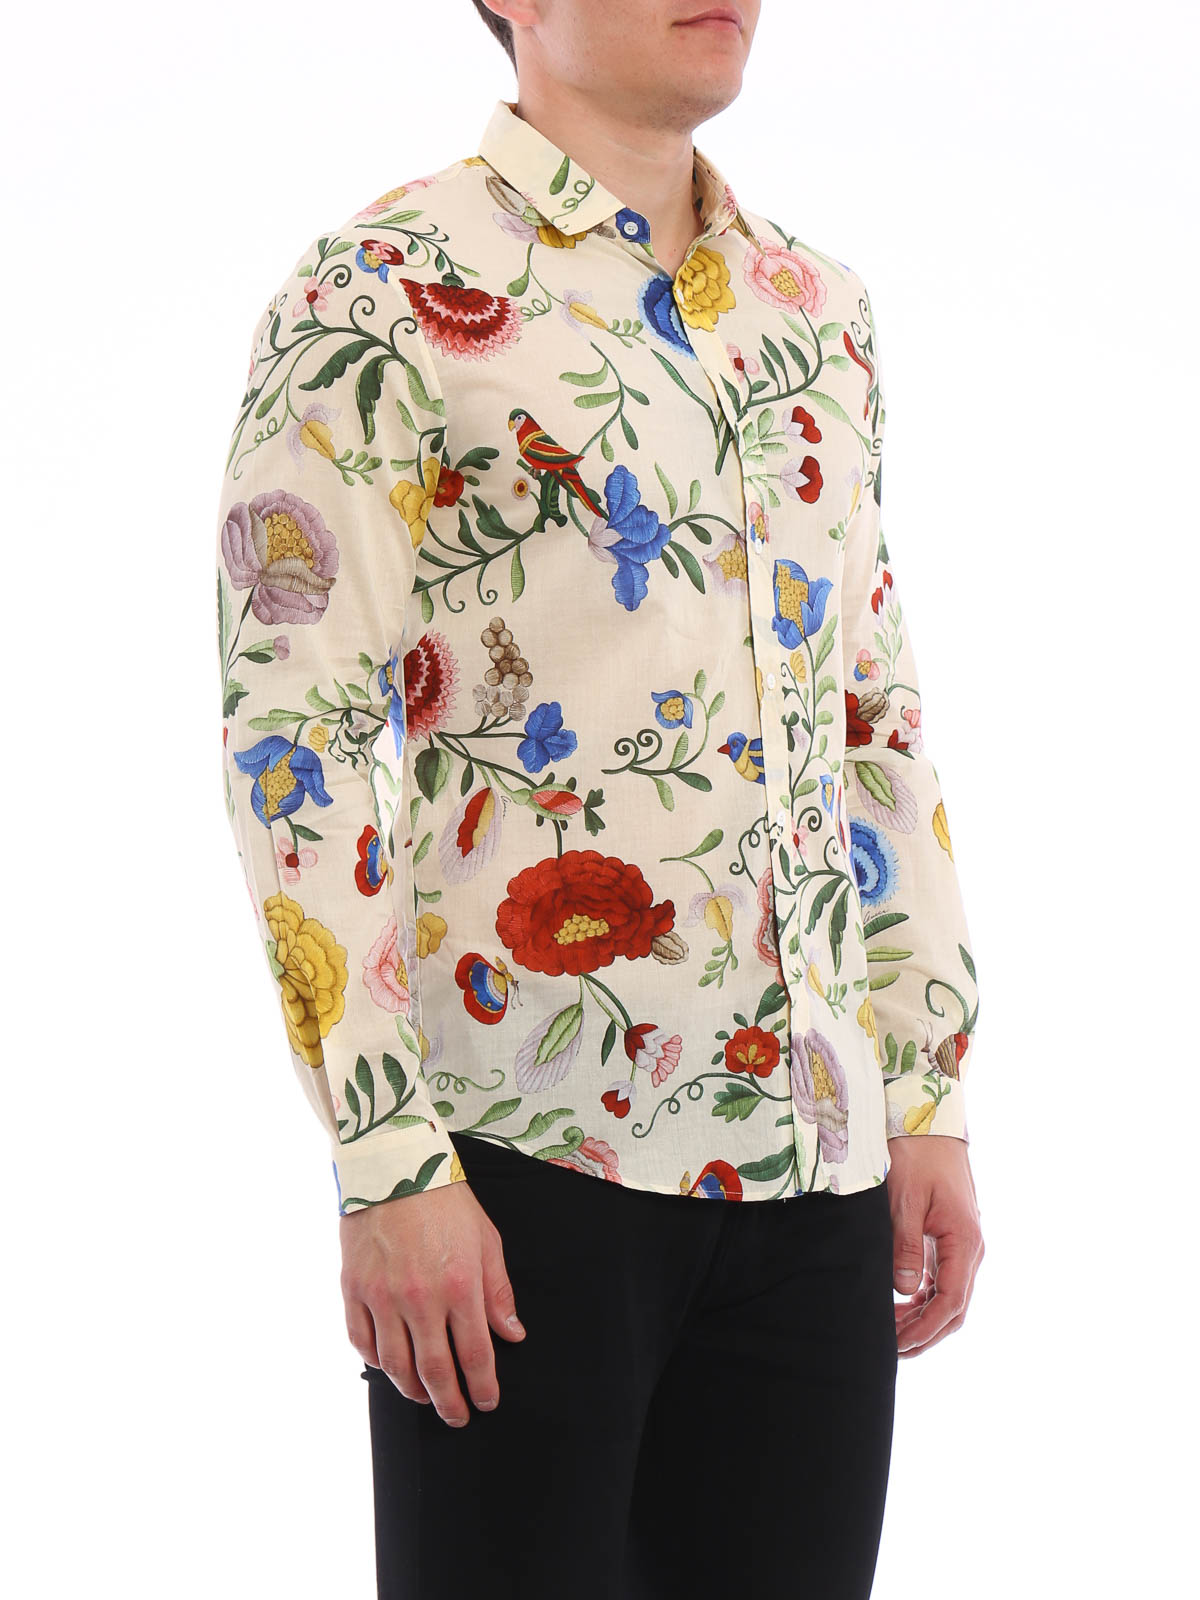 Gucci - Camisa Duke - Multicolor - Camisas - MJ9 408602 Z326A 9275 36602761d74